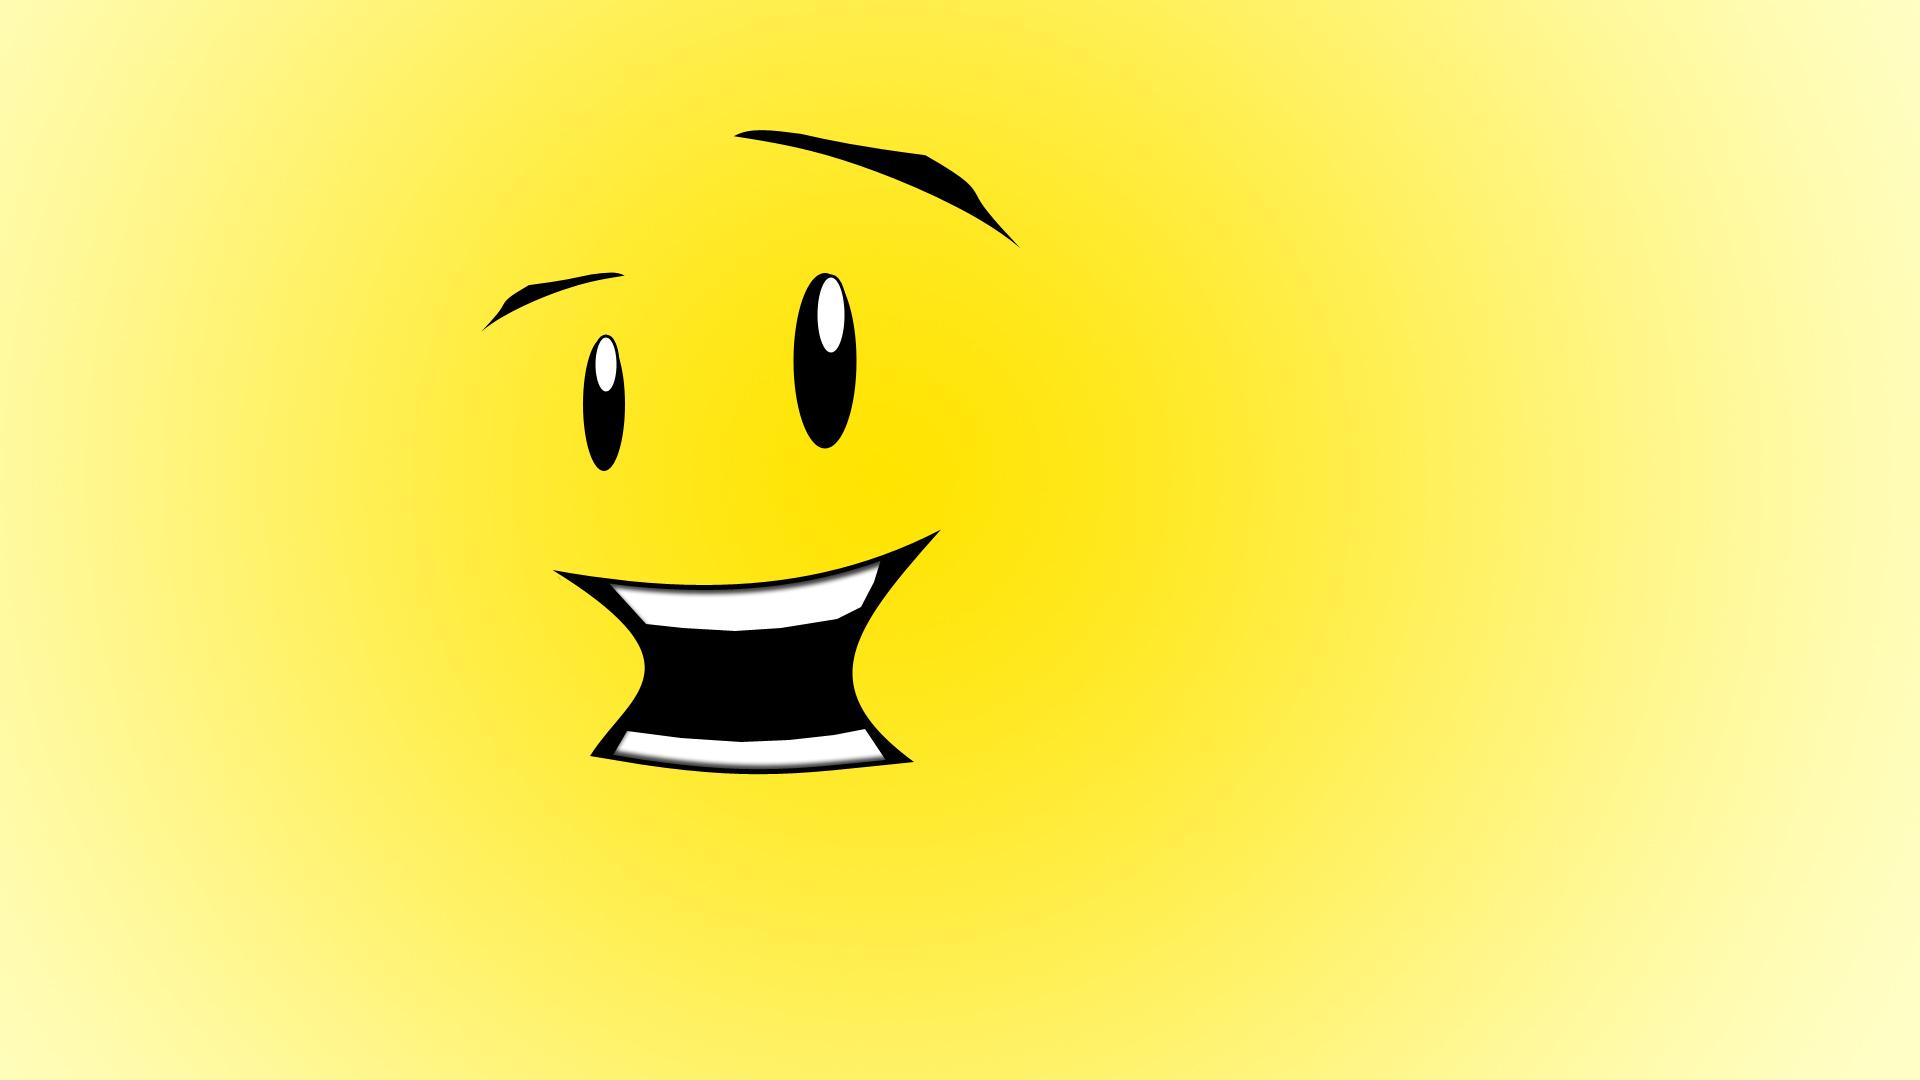 Happy face wallpaperHappy Face Wallpaper